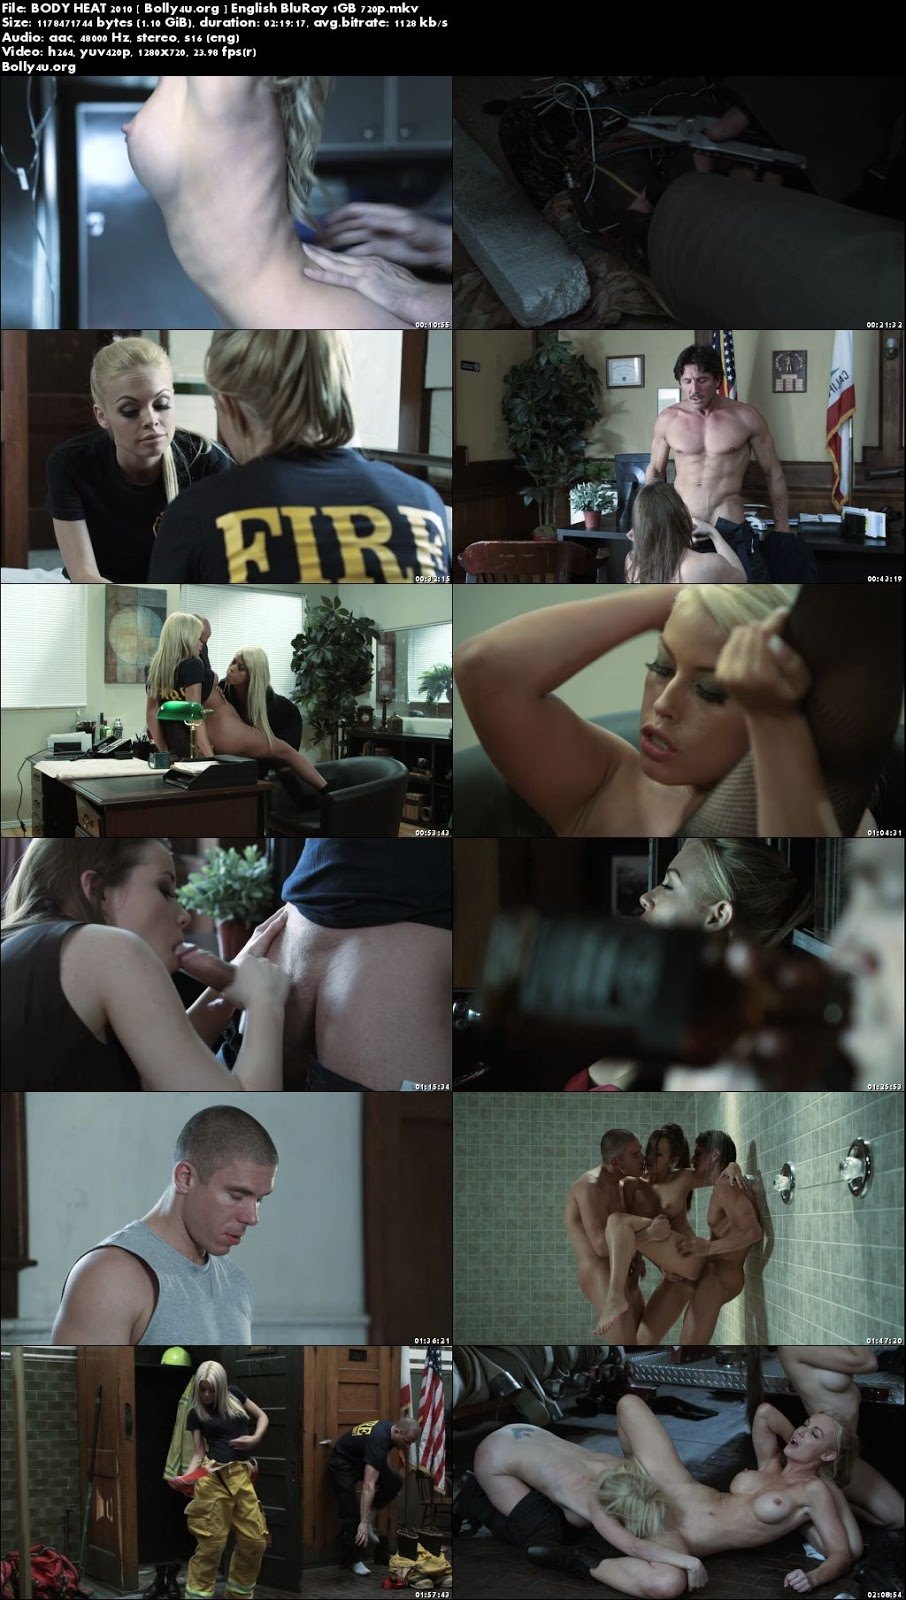 Body HeaT 2010 BluRay 1Gb Full English Movie Download 720p